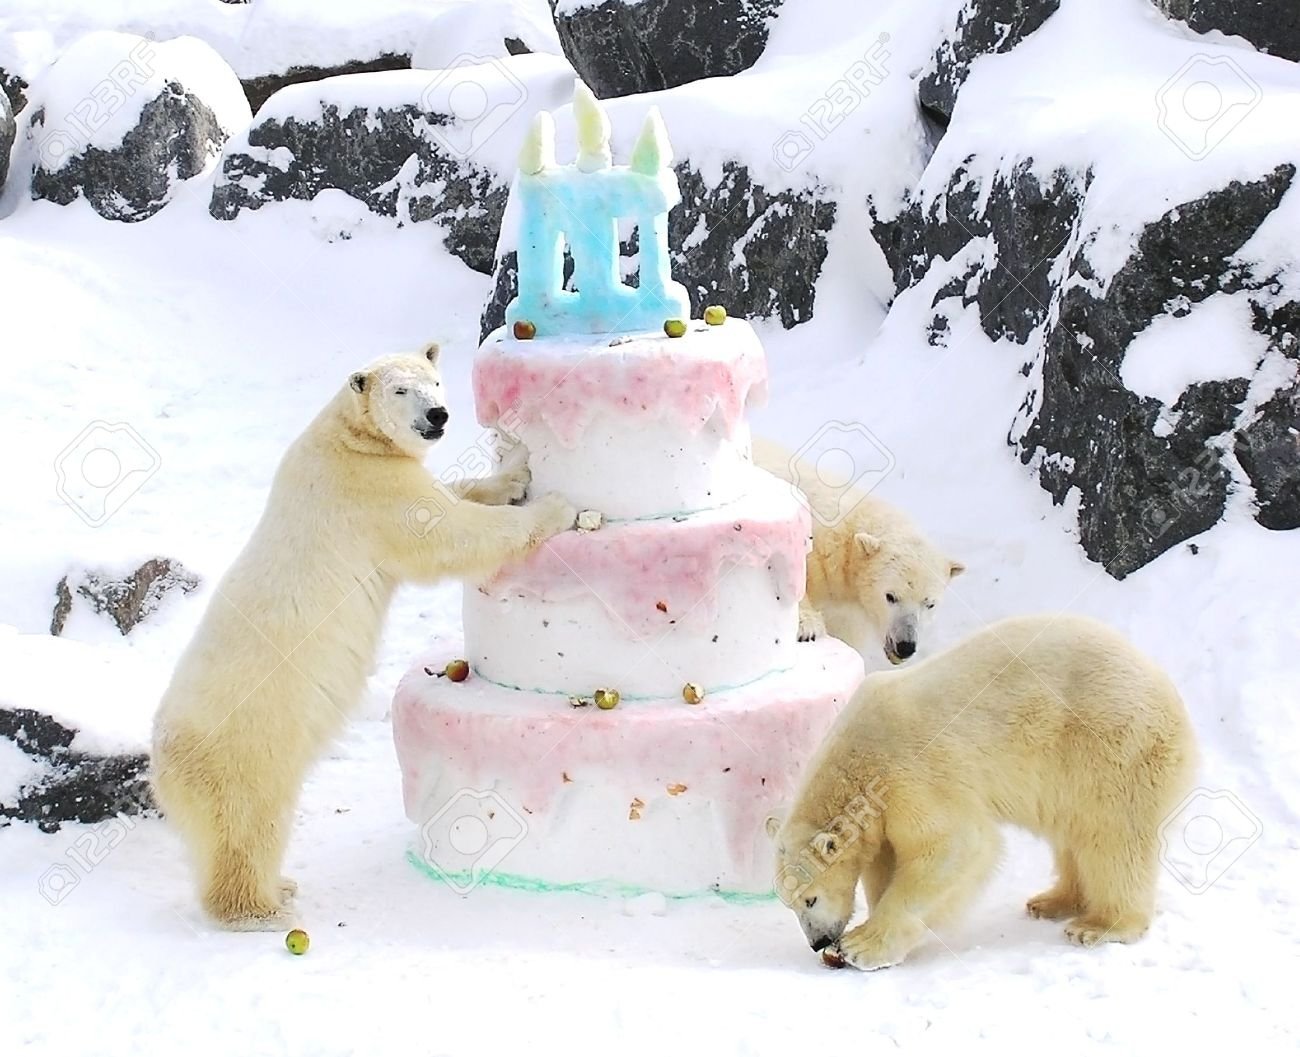 Fabulous Three Polar Bears Celebrating Their Birthday With A Giant Cake Funny Birthday Cards Online Fluifree Goldxyz